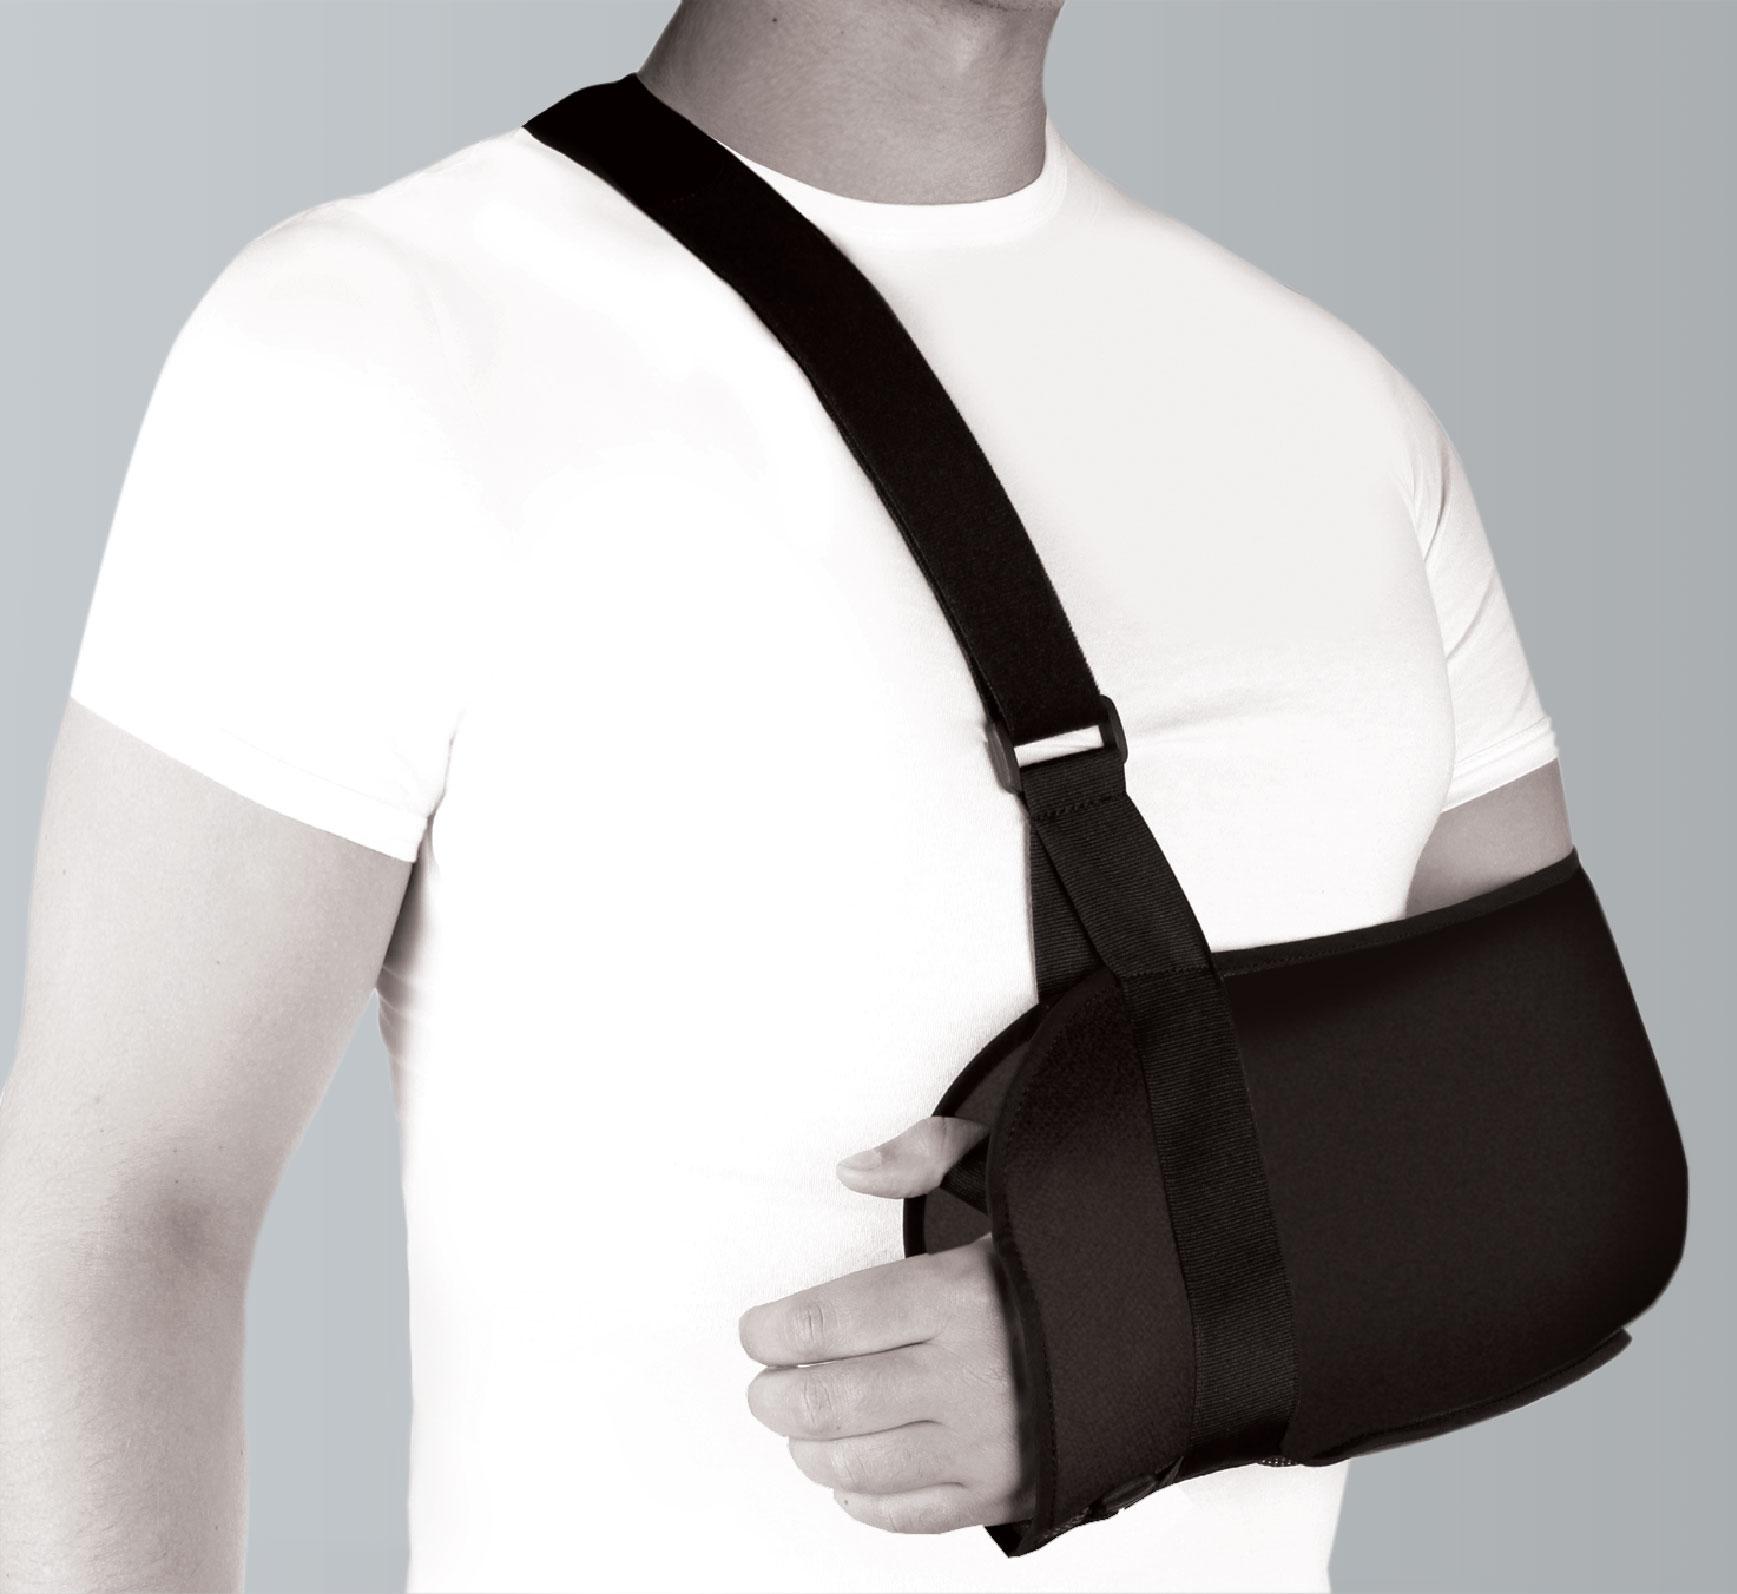 Бандаж на плечевой сустав (Косынка) TI-255 от интернет-магазина Клеон